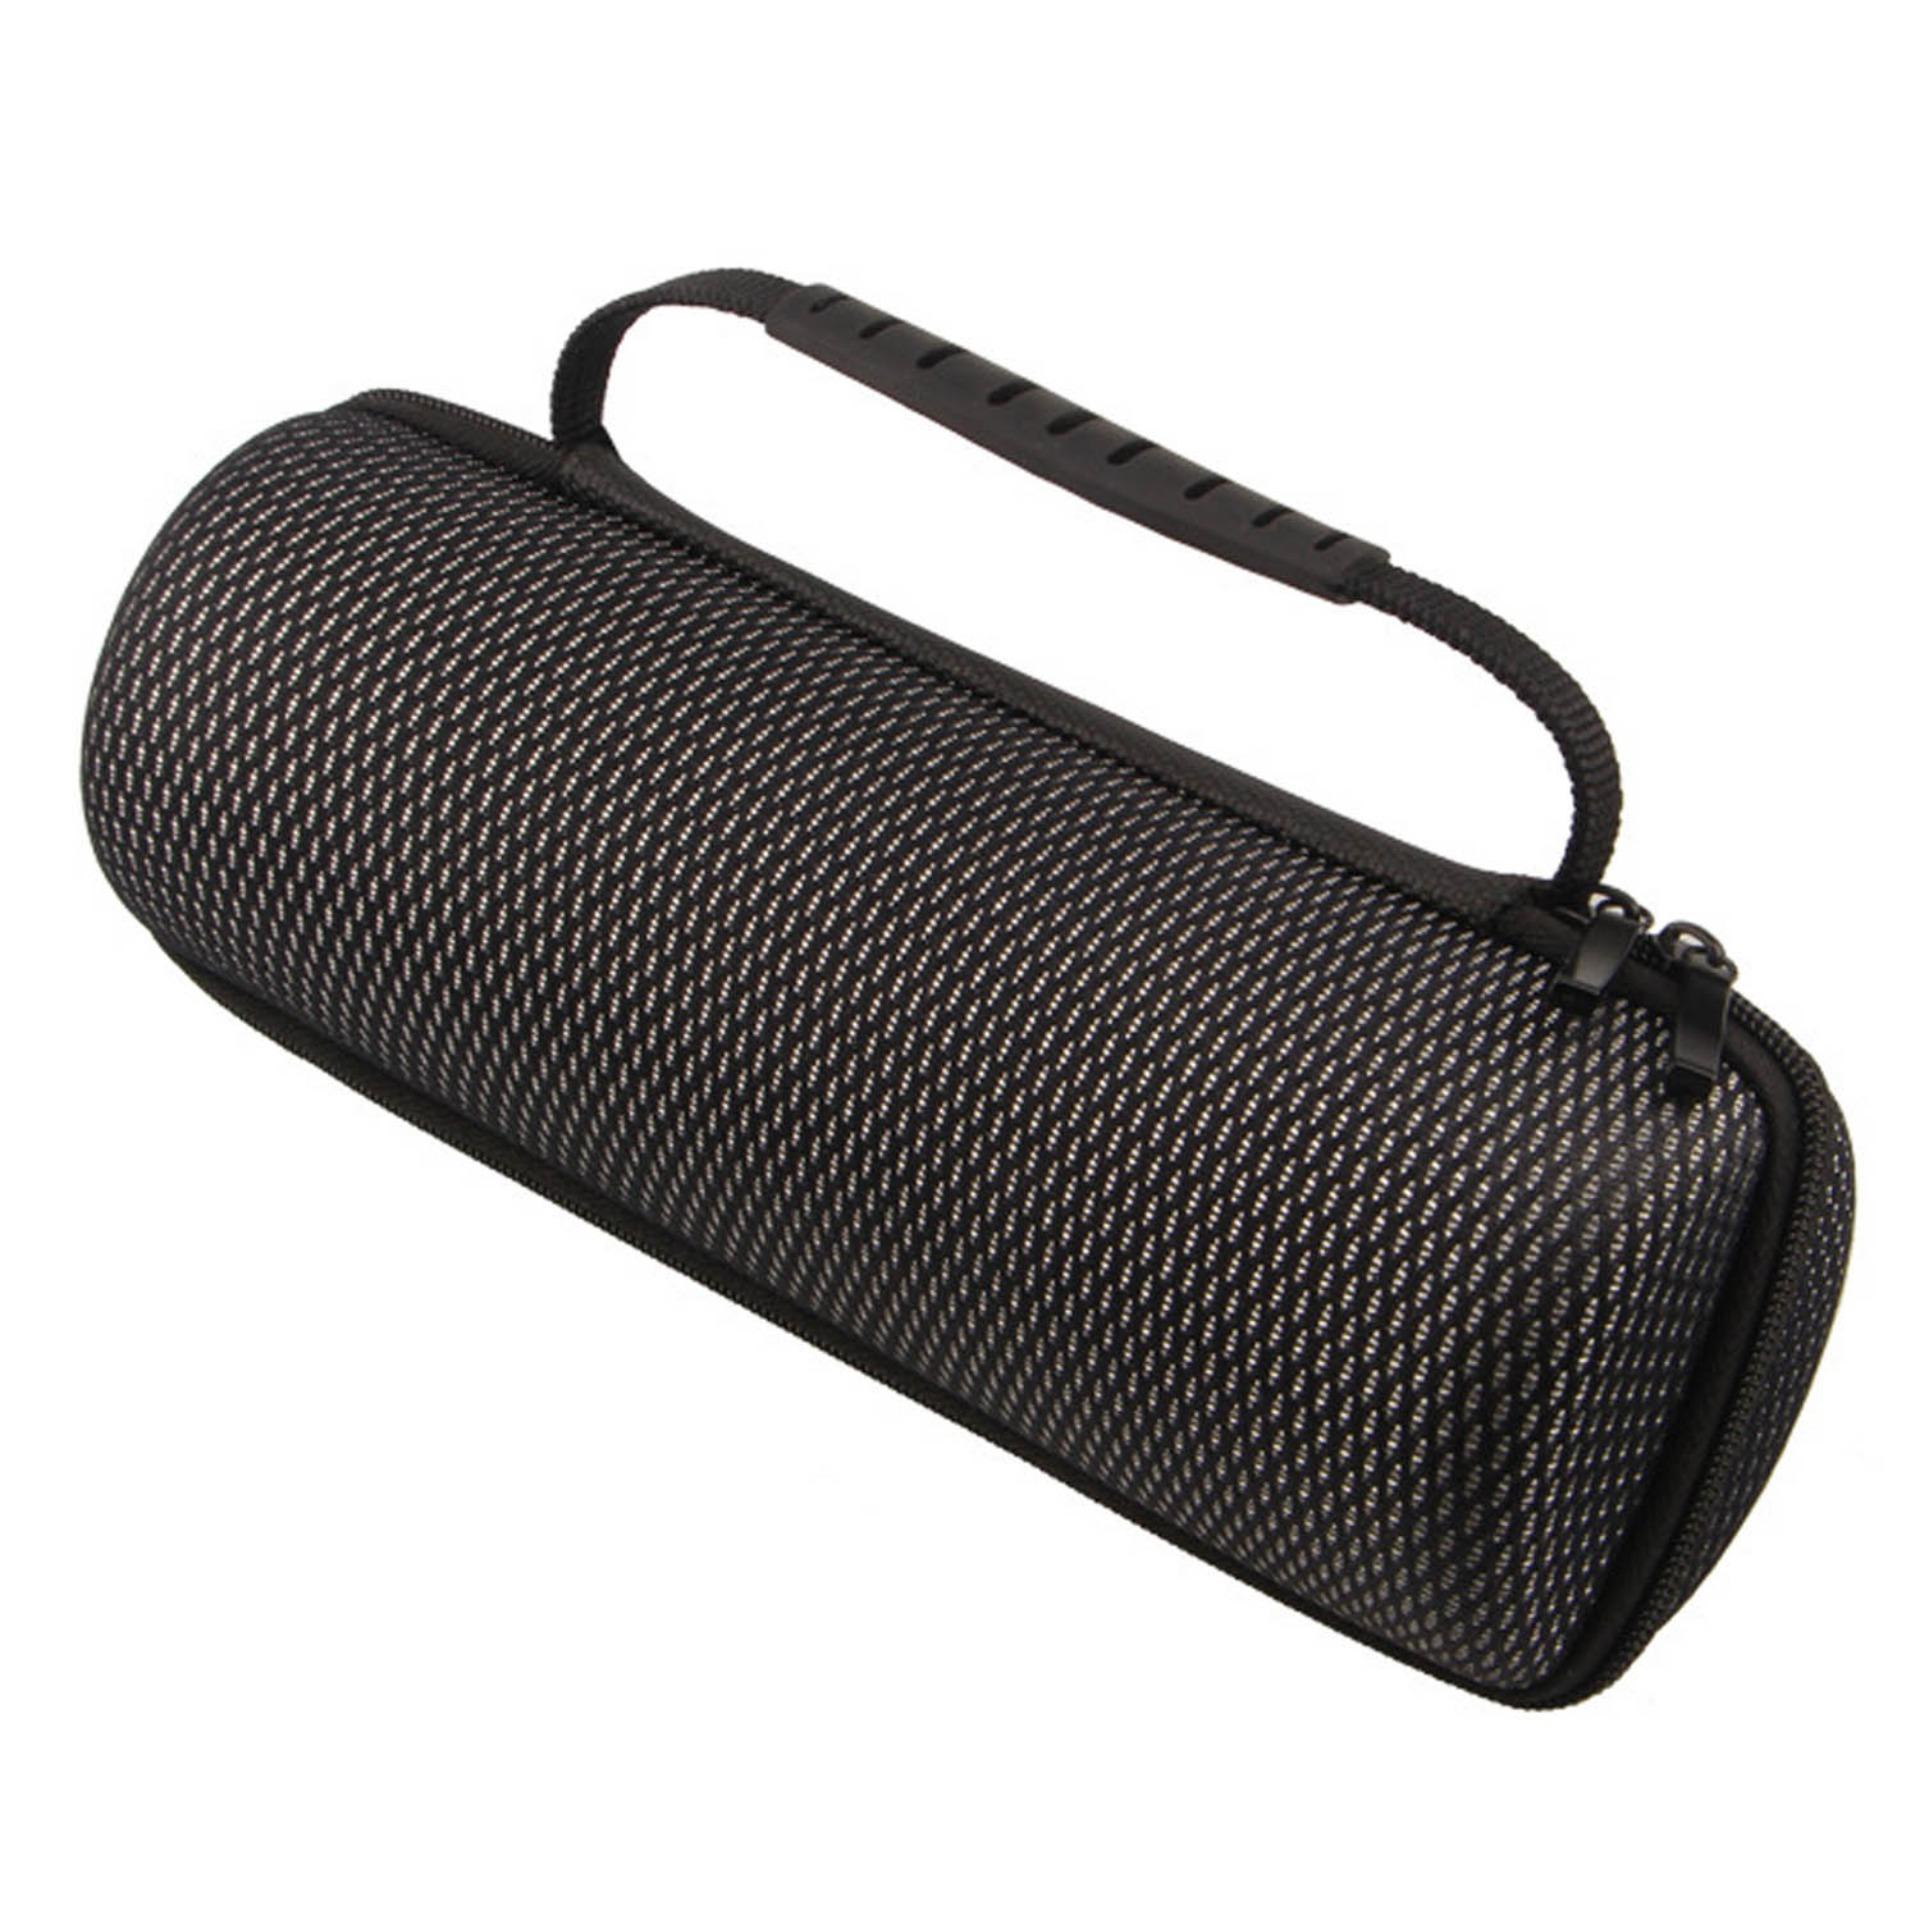 Detail Gambar Portable EVA Shockproof Waterproof Wireless Bluetooth Speaker Storage Carry Case Bag Cover for JBL Flip 1 2 3 4 Hiking Travel Outdoor (Black) ...